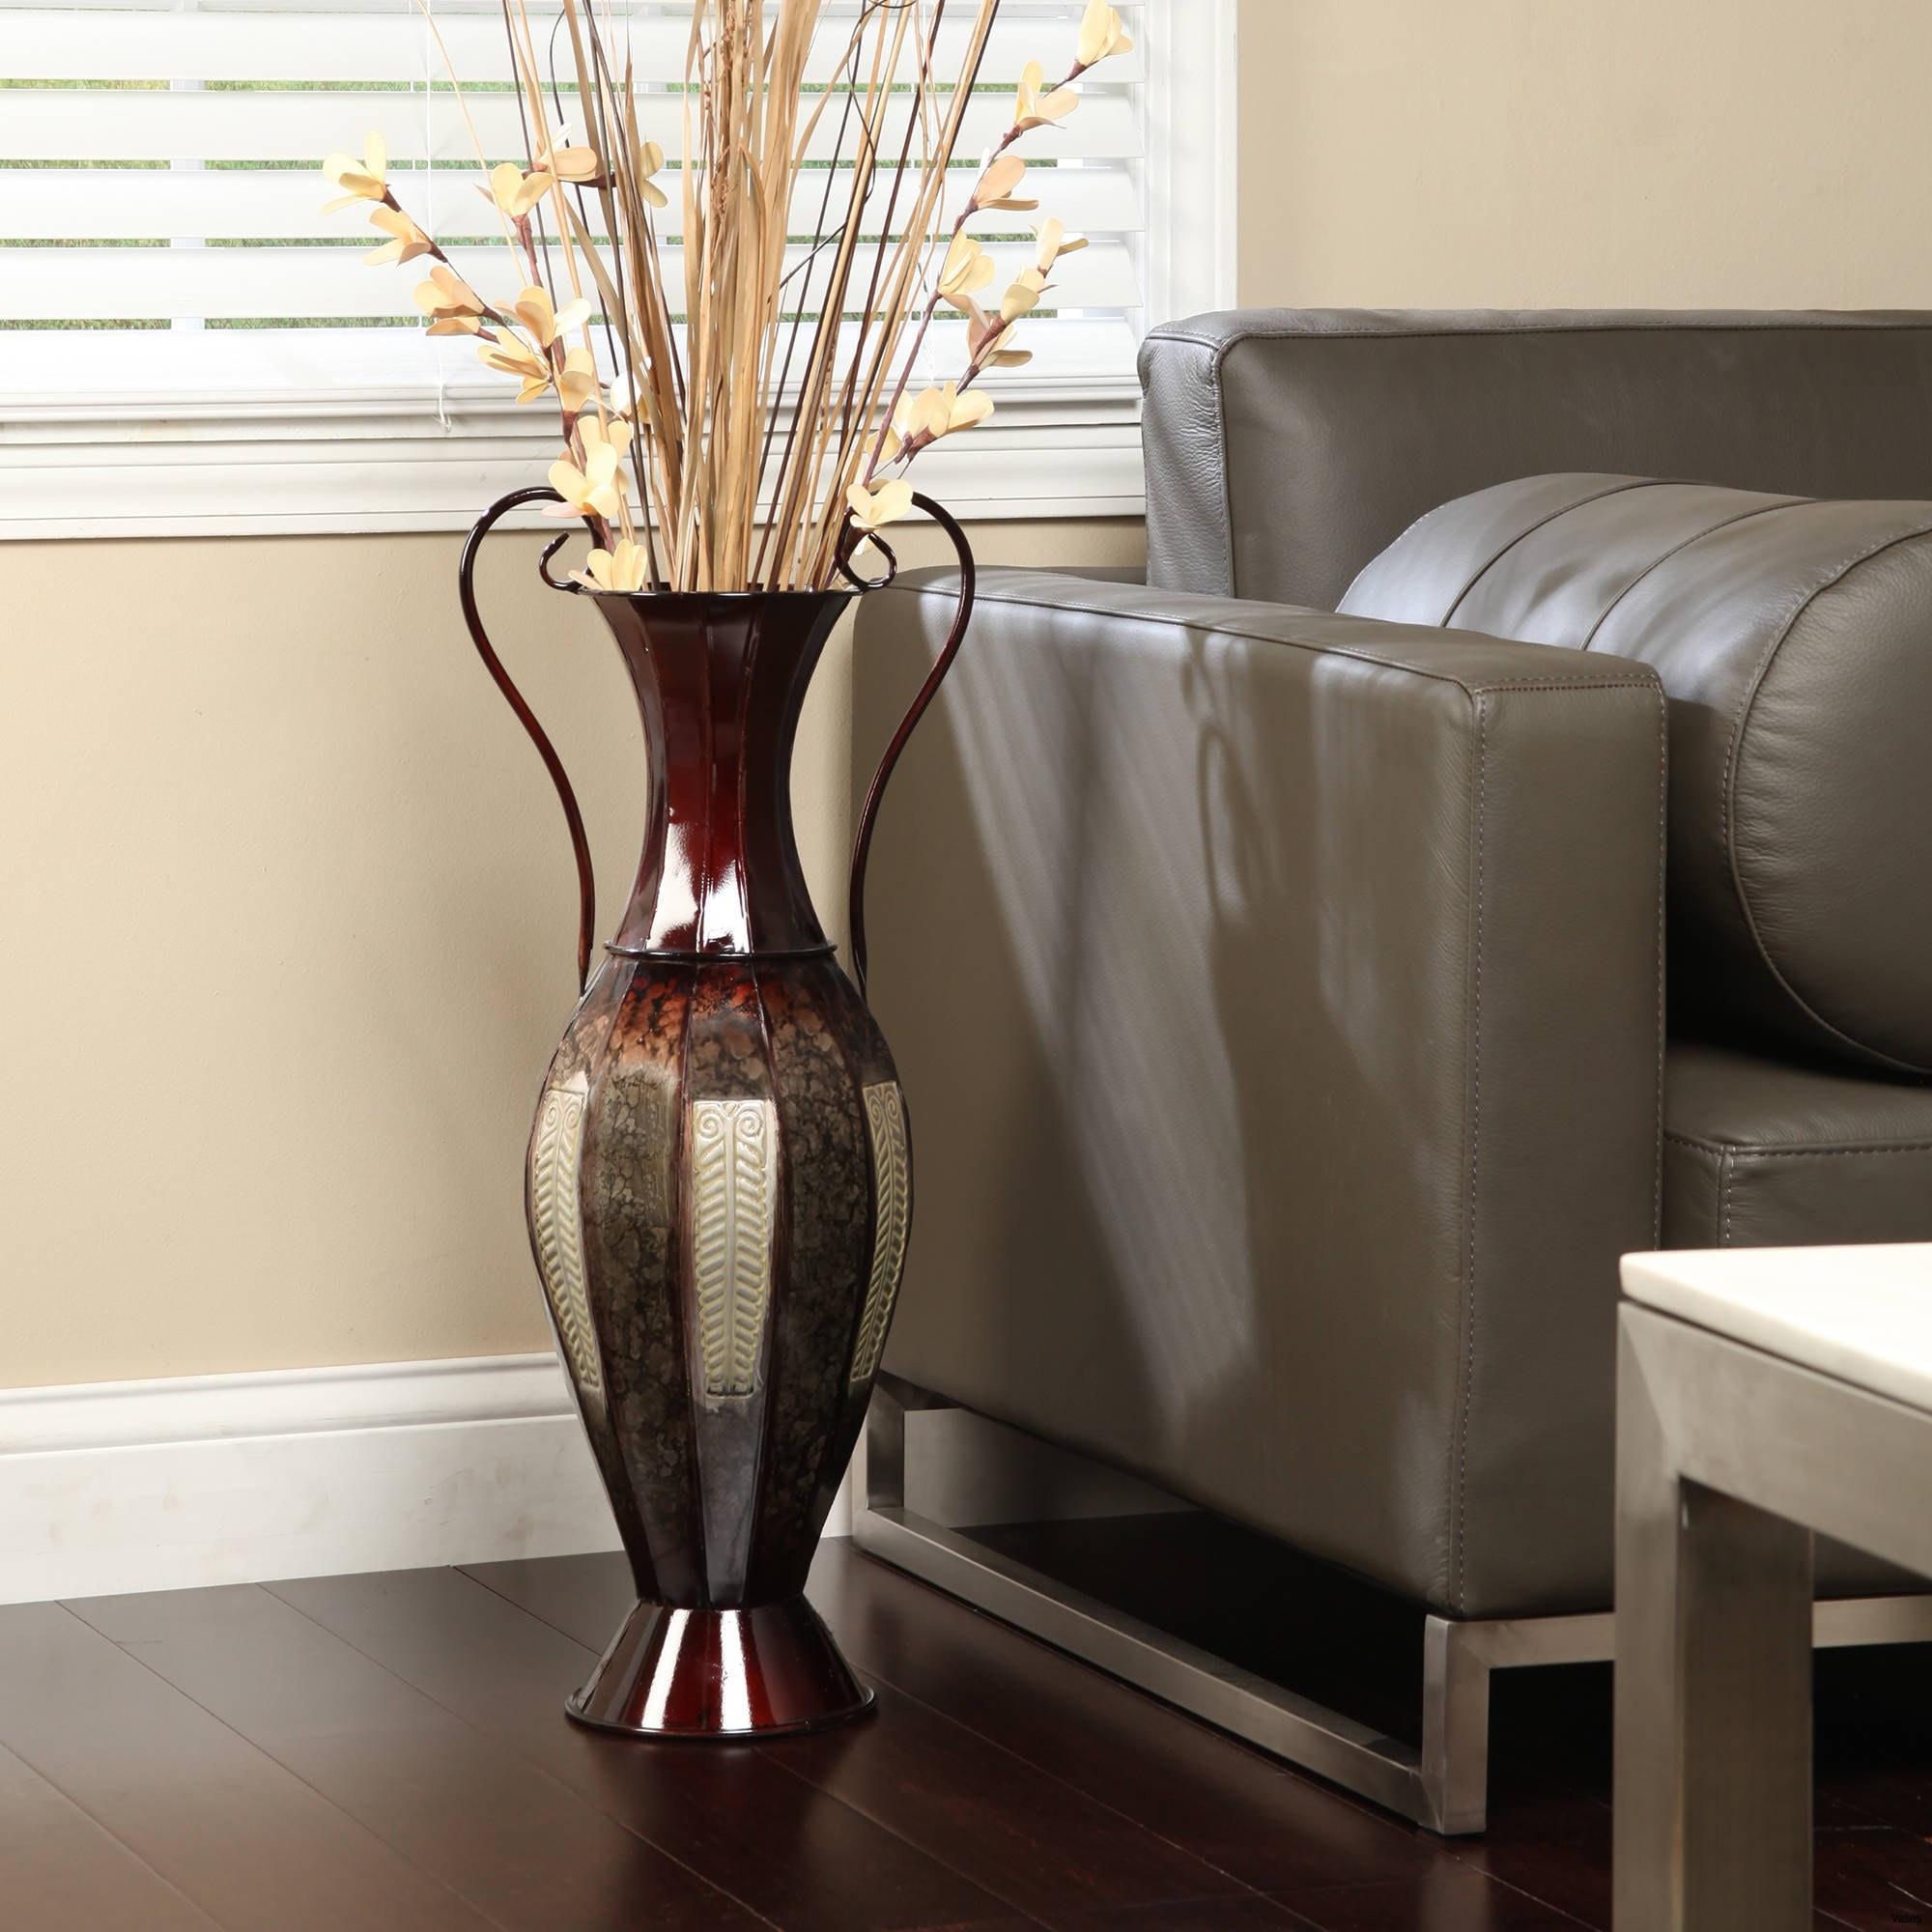 4 Foot Tall Floor Vases Of 4 Foot Floor Vase Luxury Floor Plans New 9 Beautiful Floor Vases within 4 Foot Floor Vase Luxury Floor Plans New 9 Beautiful Floor Vases Qosy for Tall Vaseh